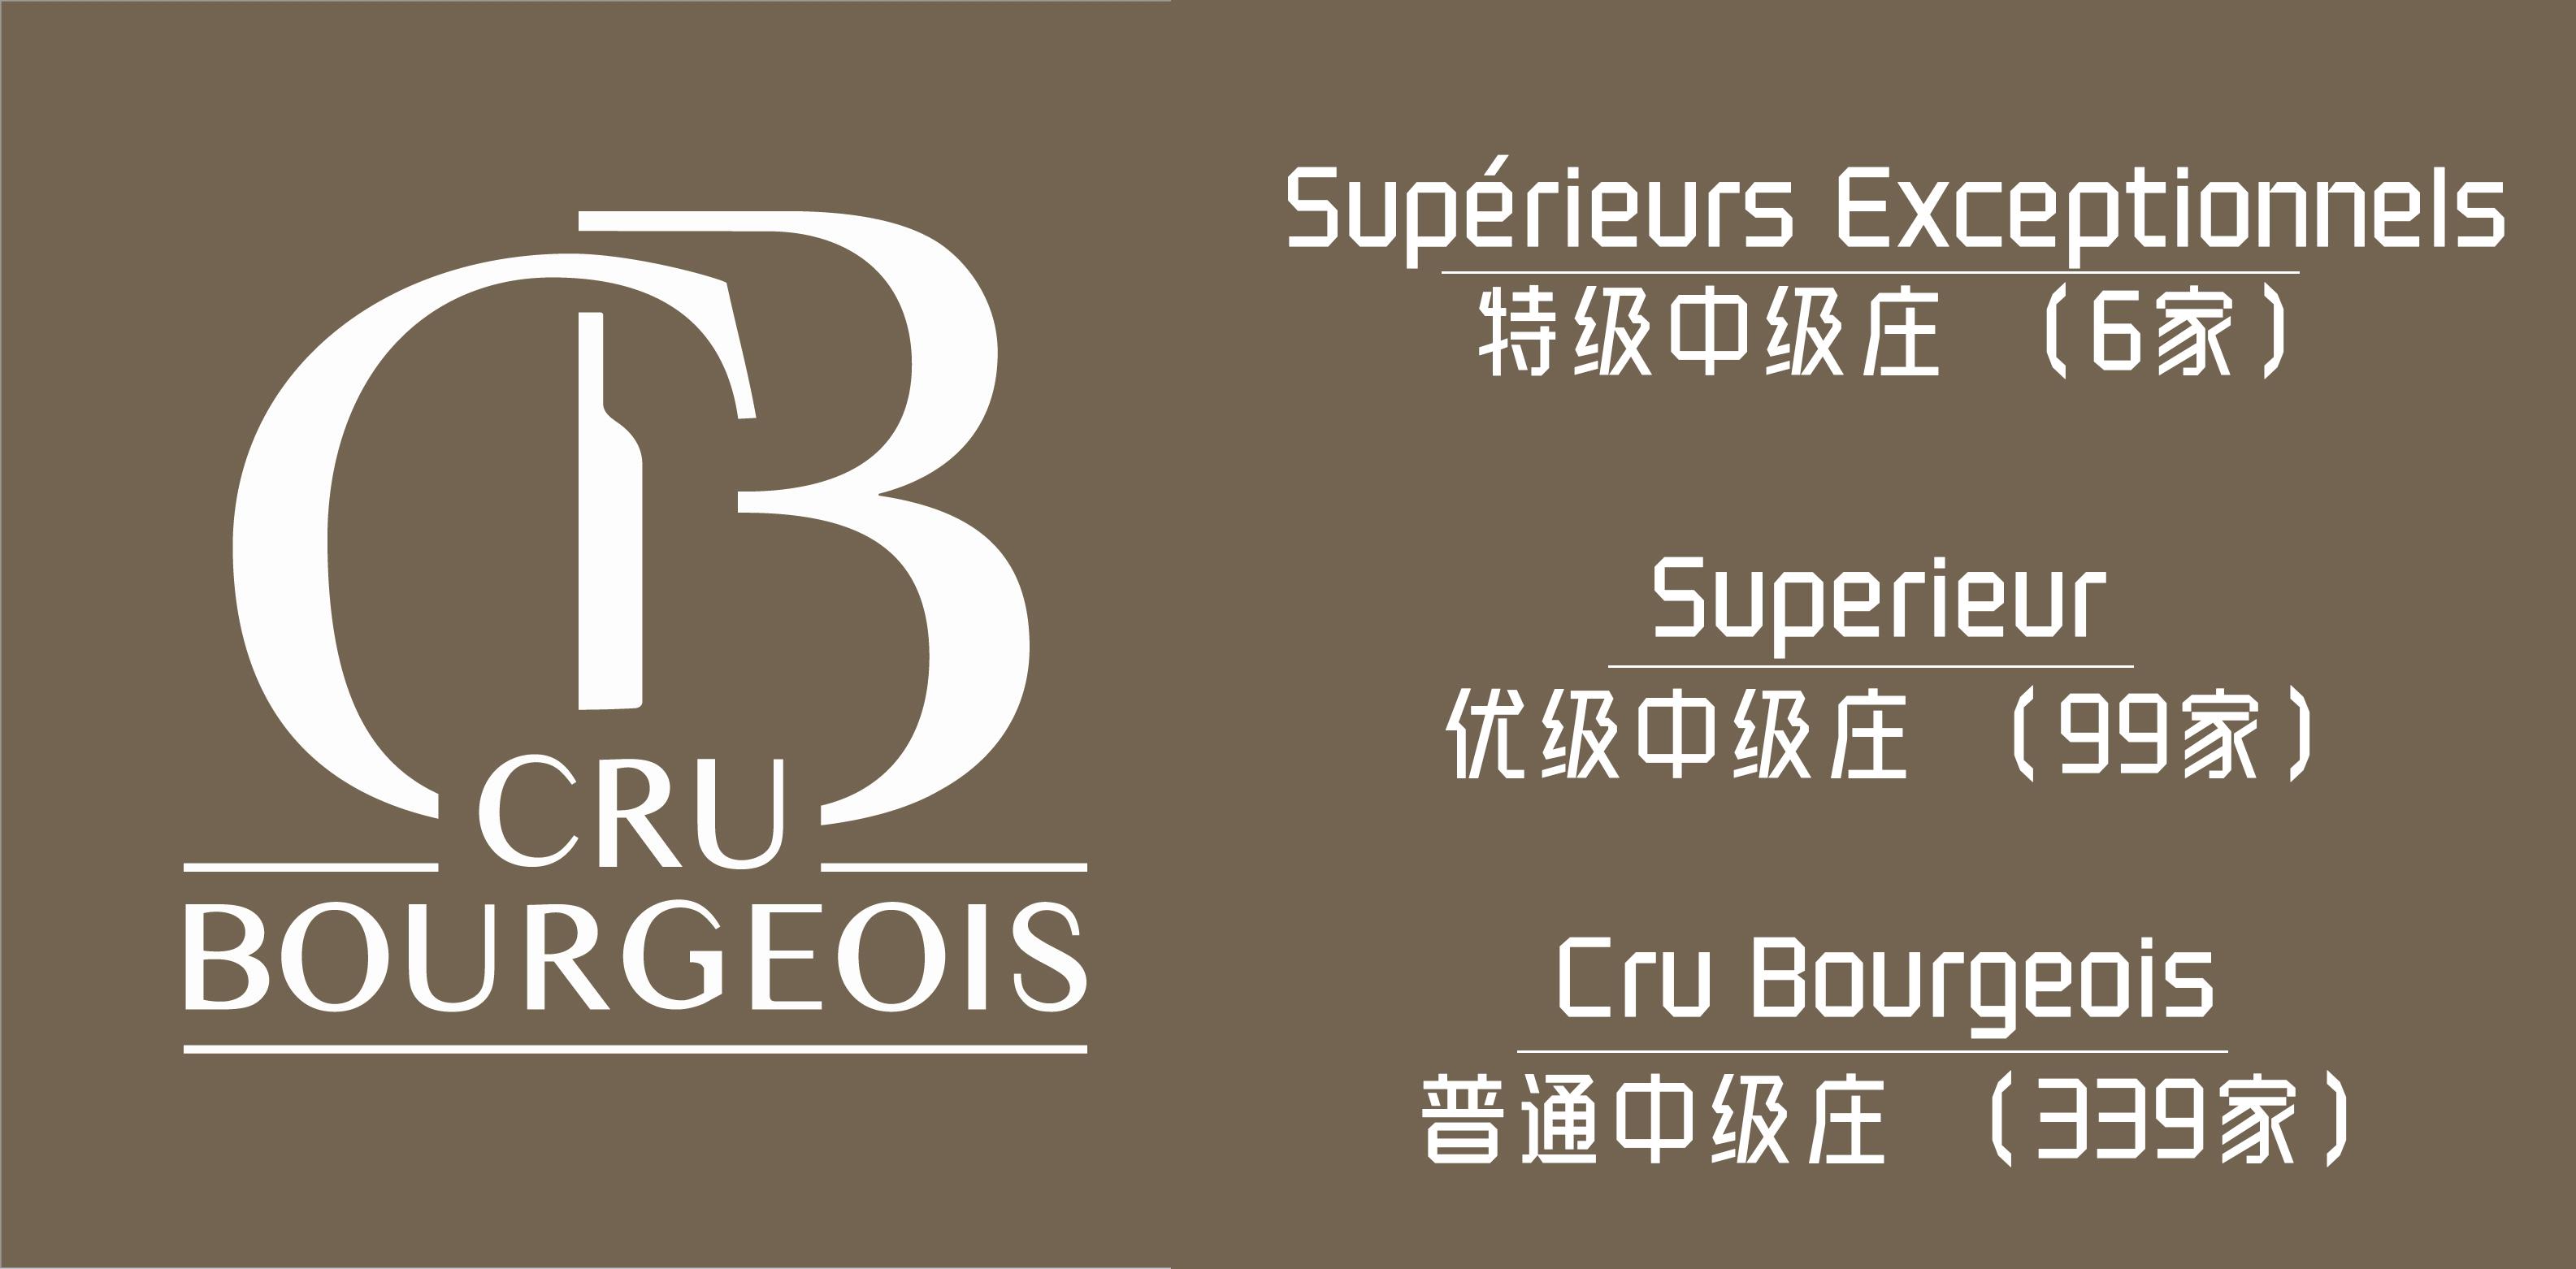 Cru-Bourgeois-Class